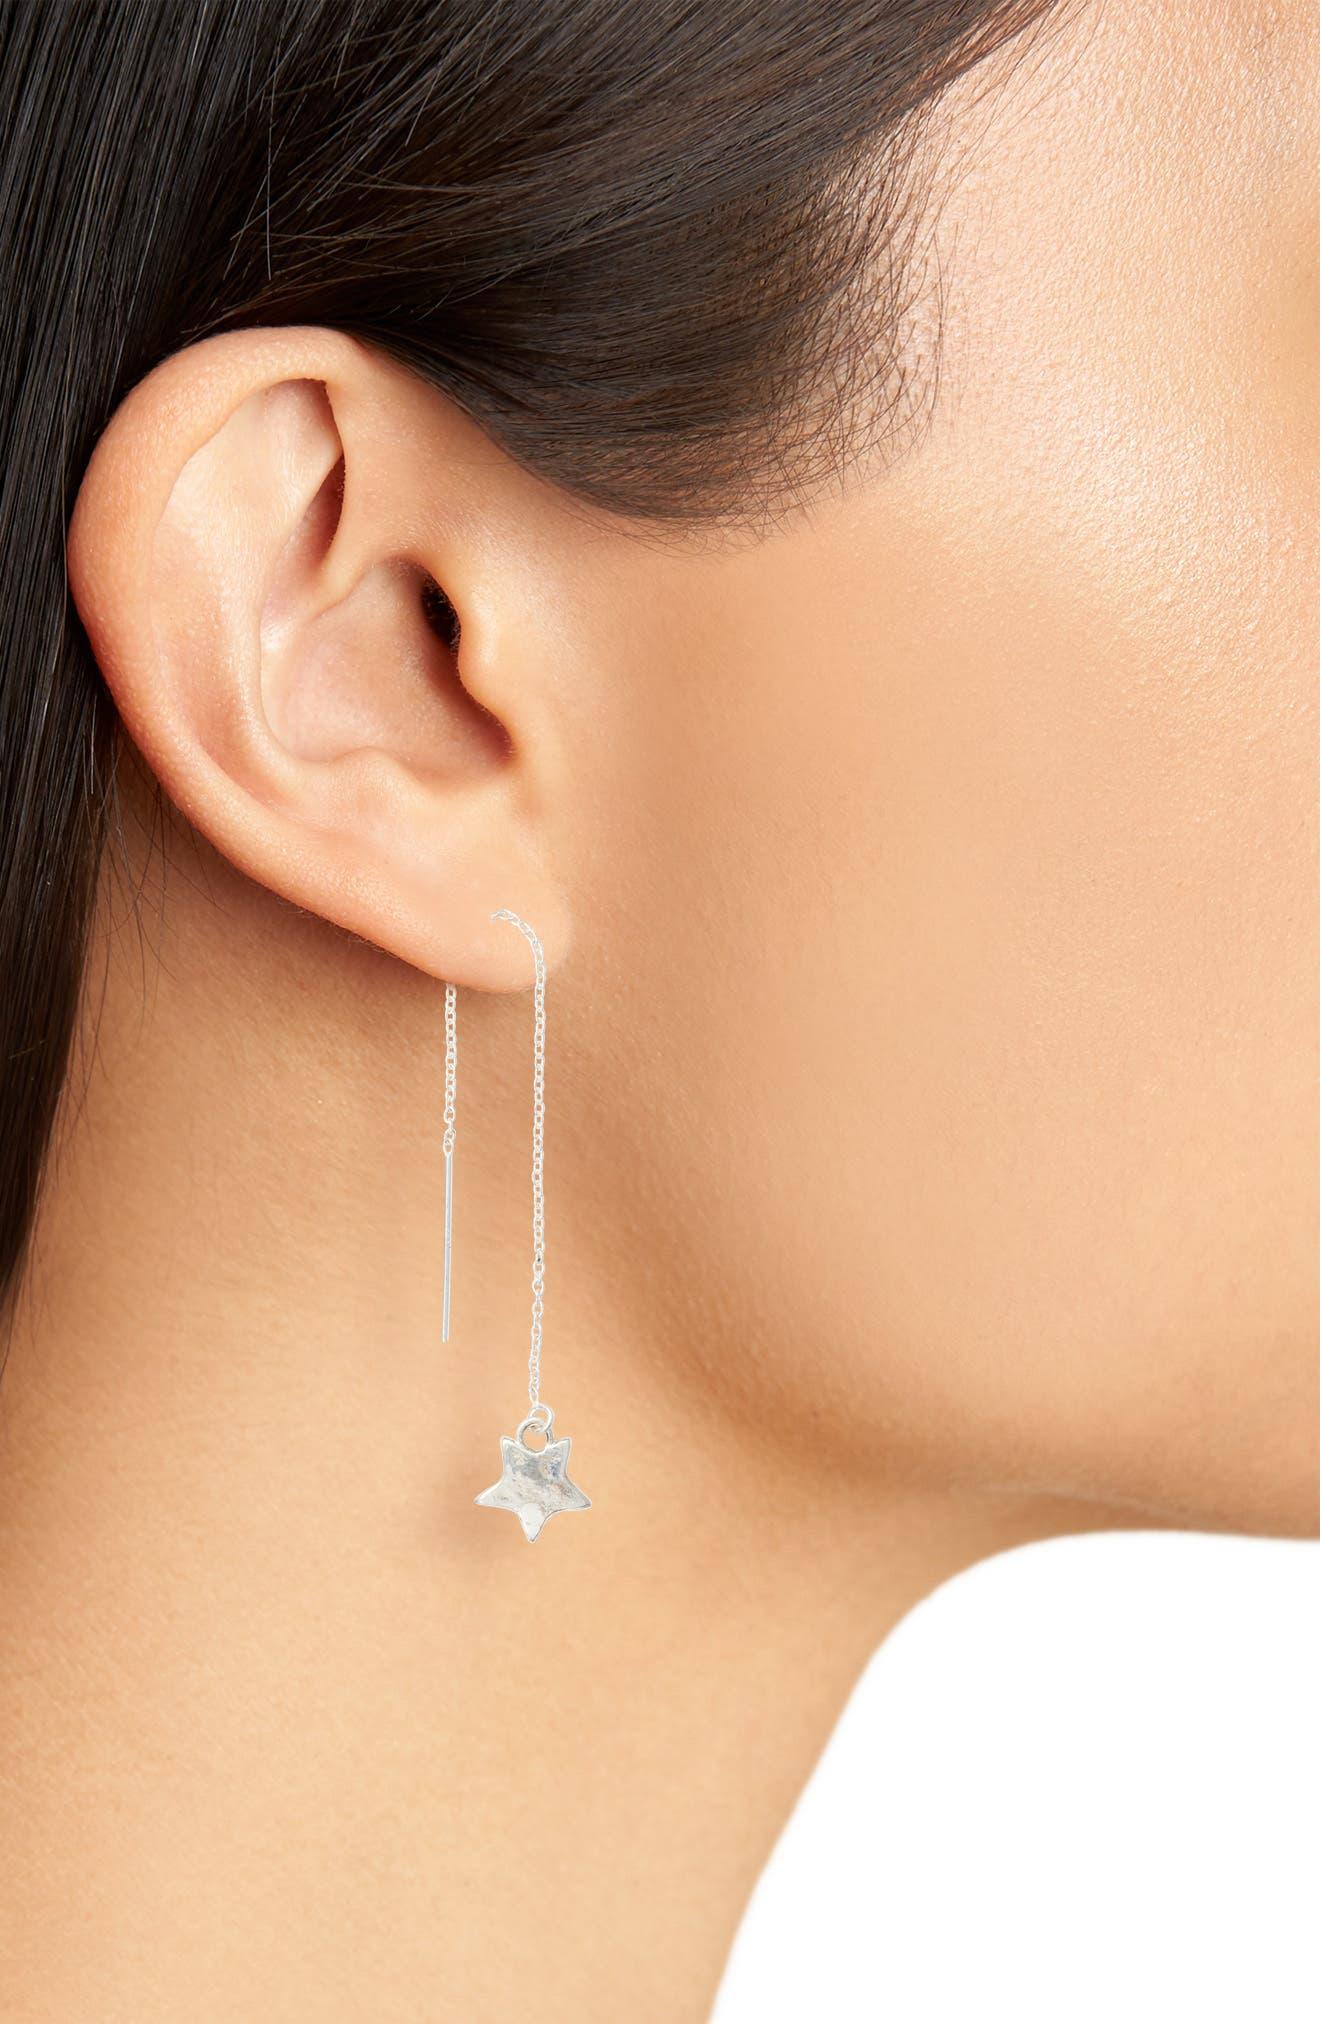 Star Drop Earrings,                             Alternate thumbnail 2, color,                             040